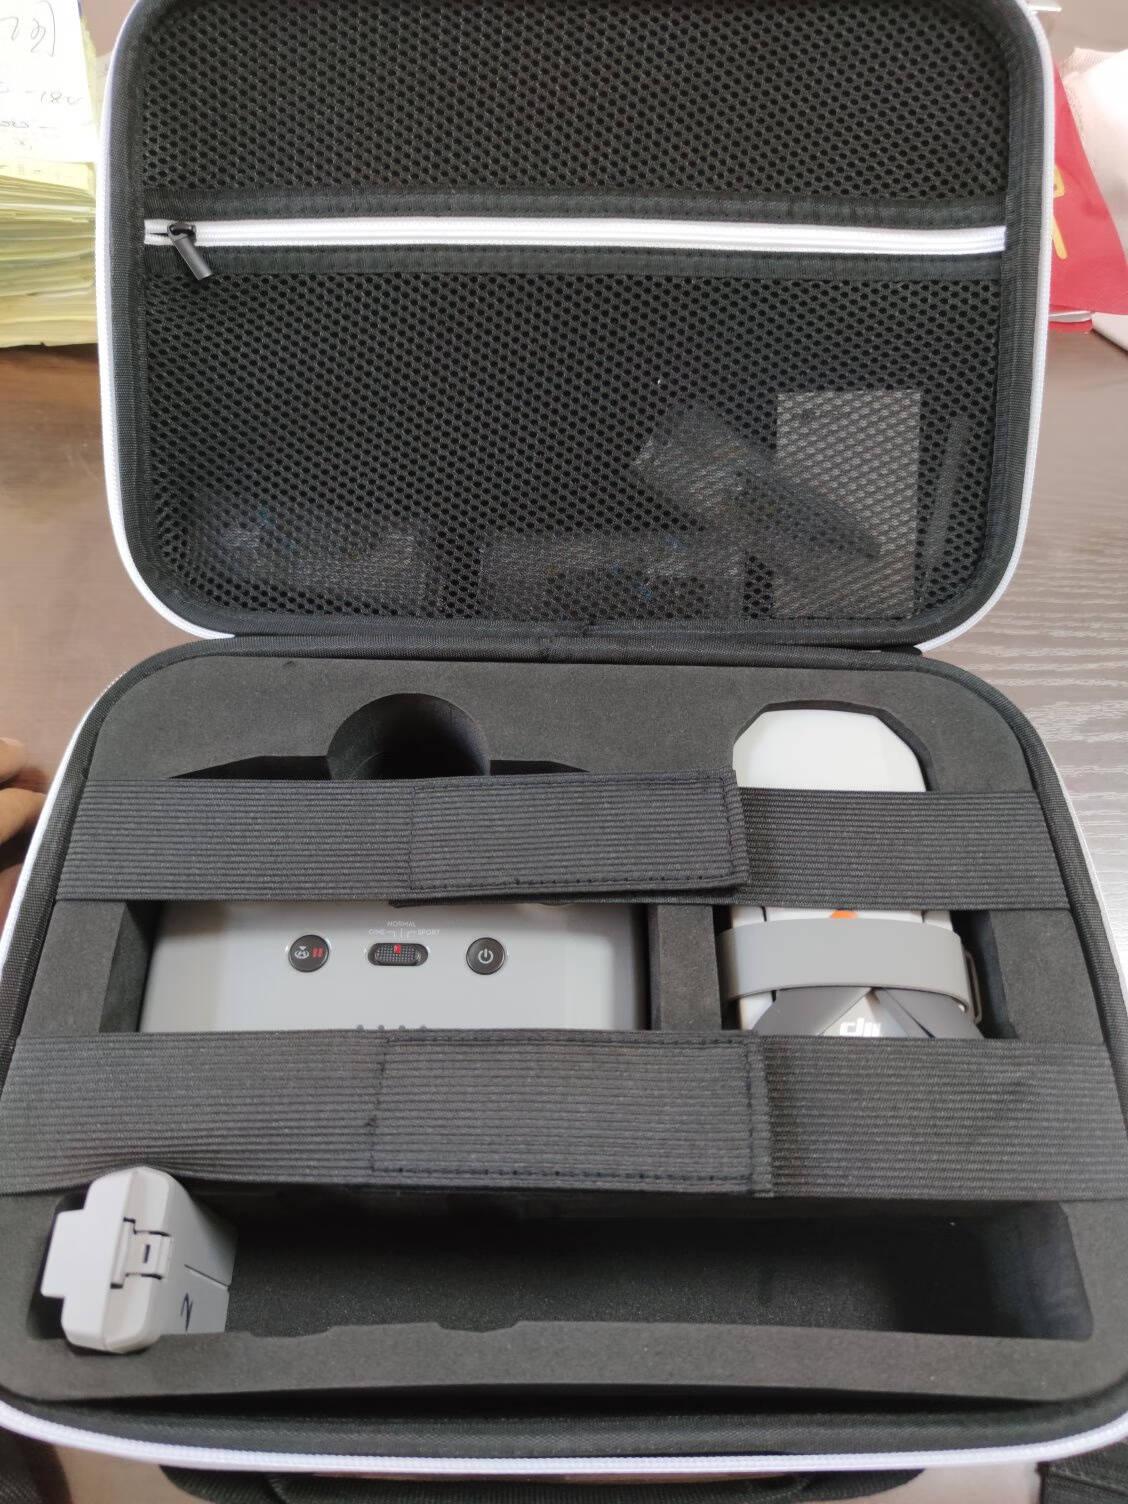 MAXCAM适用DJI大疆御背包MAVICMINI2收纳包便携安全mini2保护箱盒配件硬壳挎单肩背包抗压摔防溅水